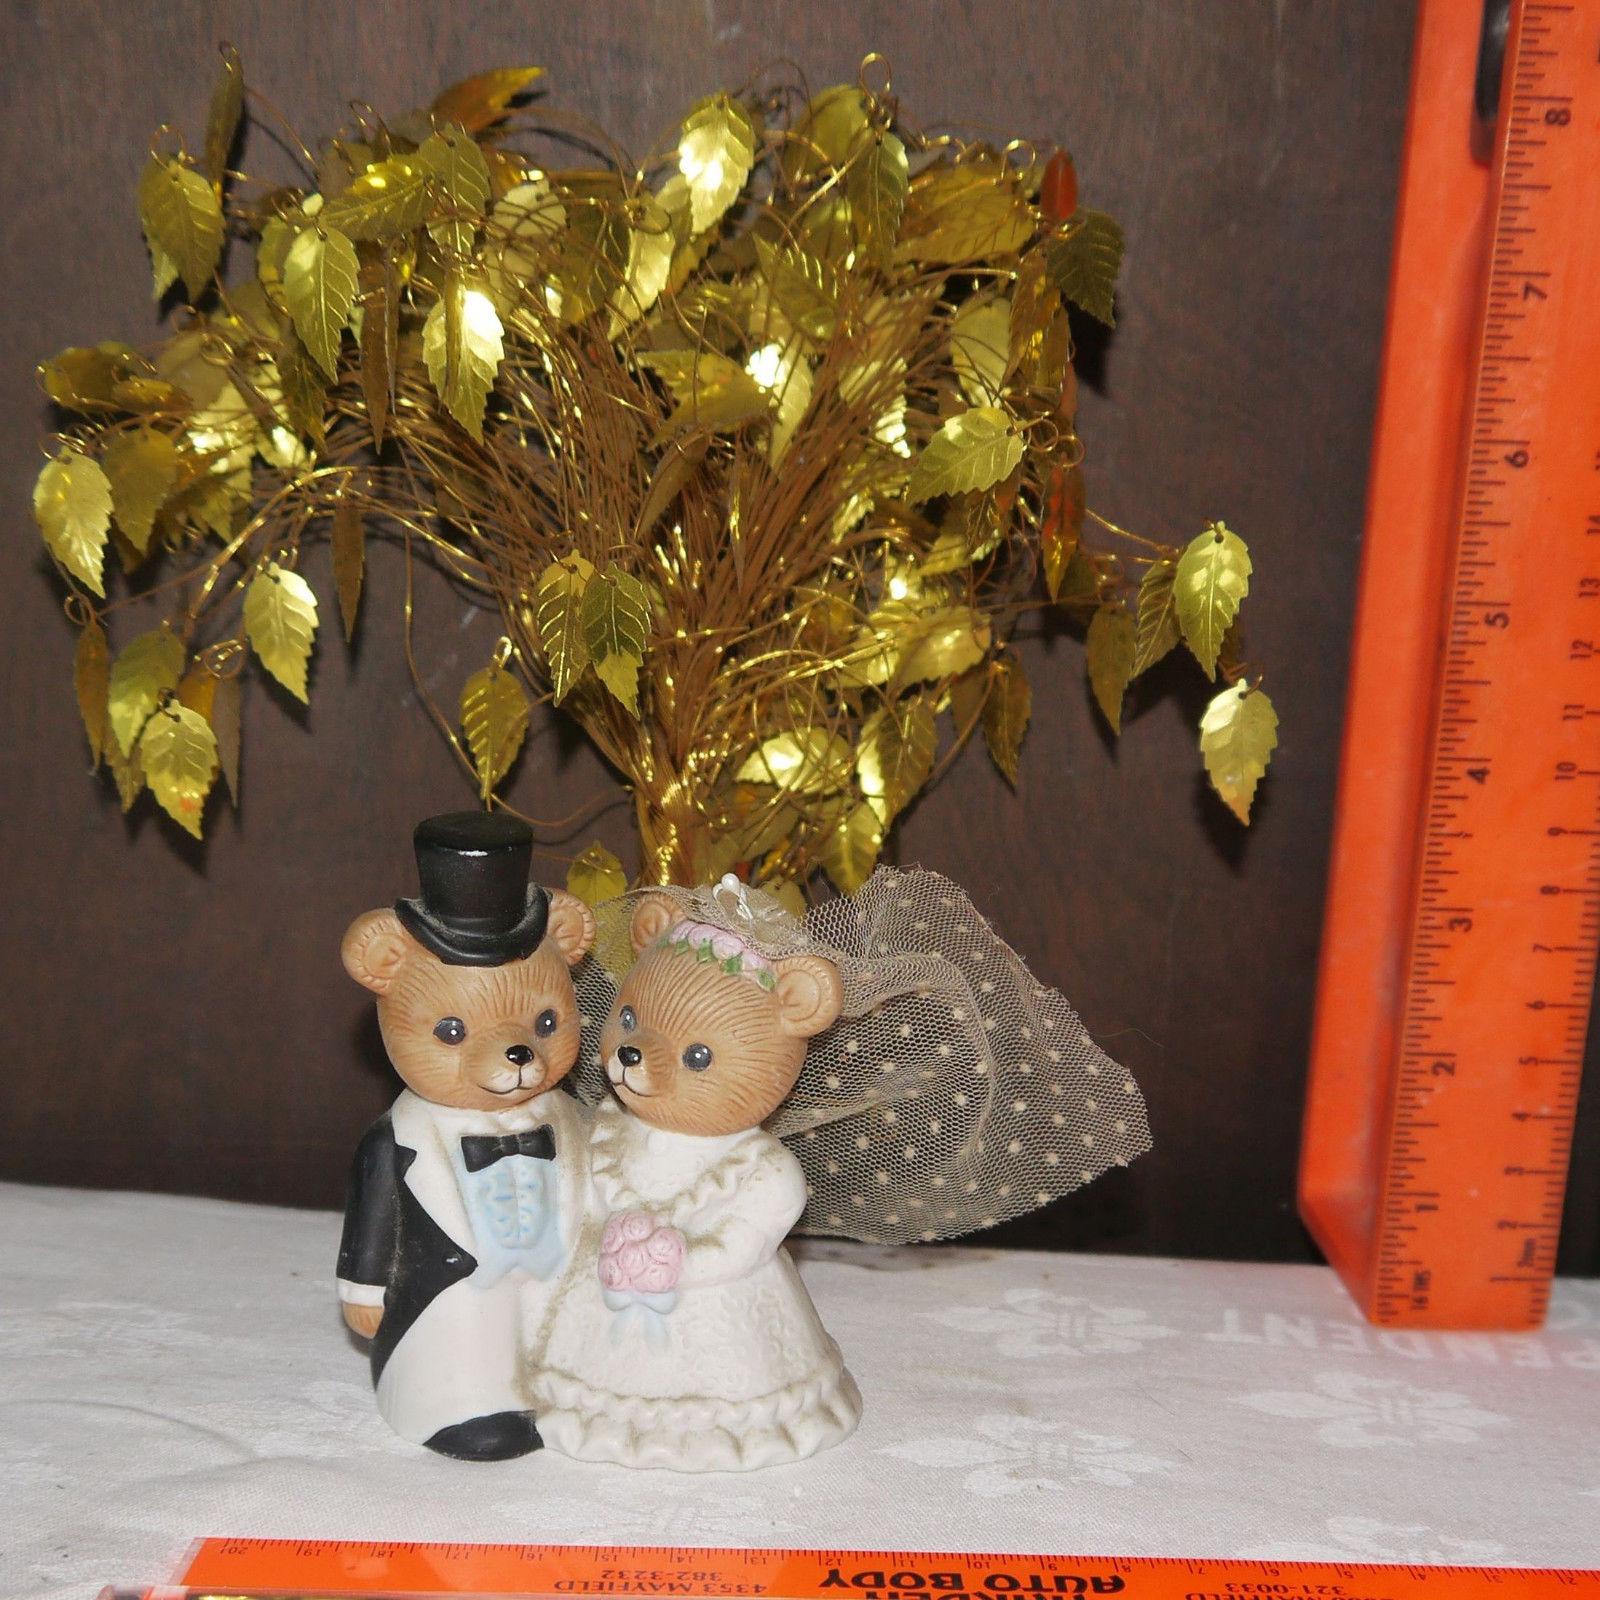 Homco Home Interiors Porcelain Teddy Bear Bride Groom